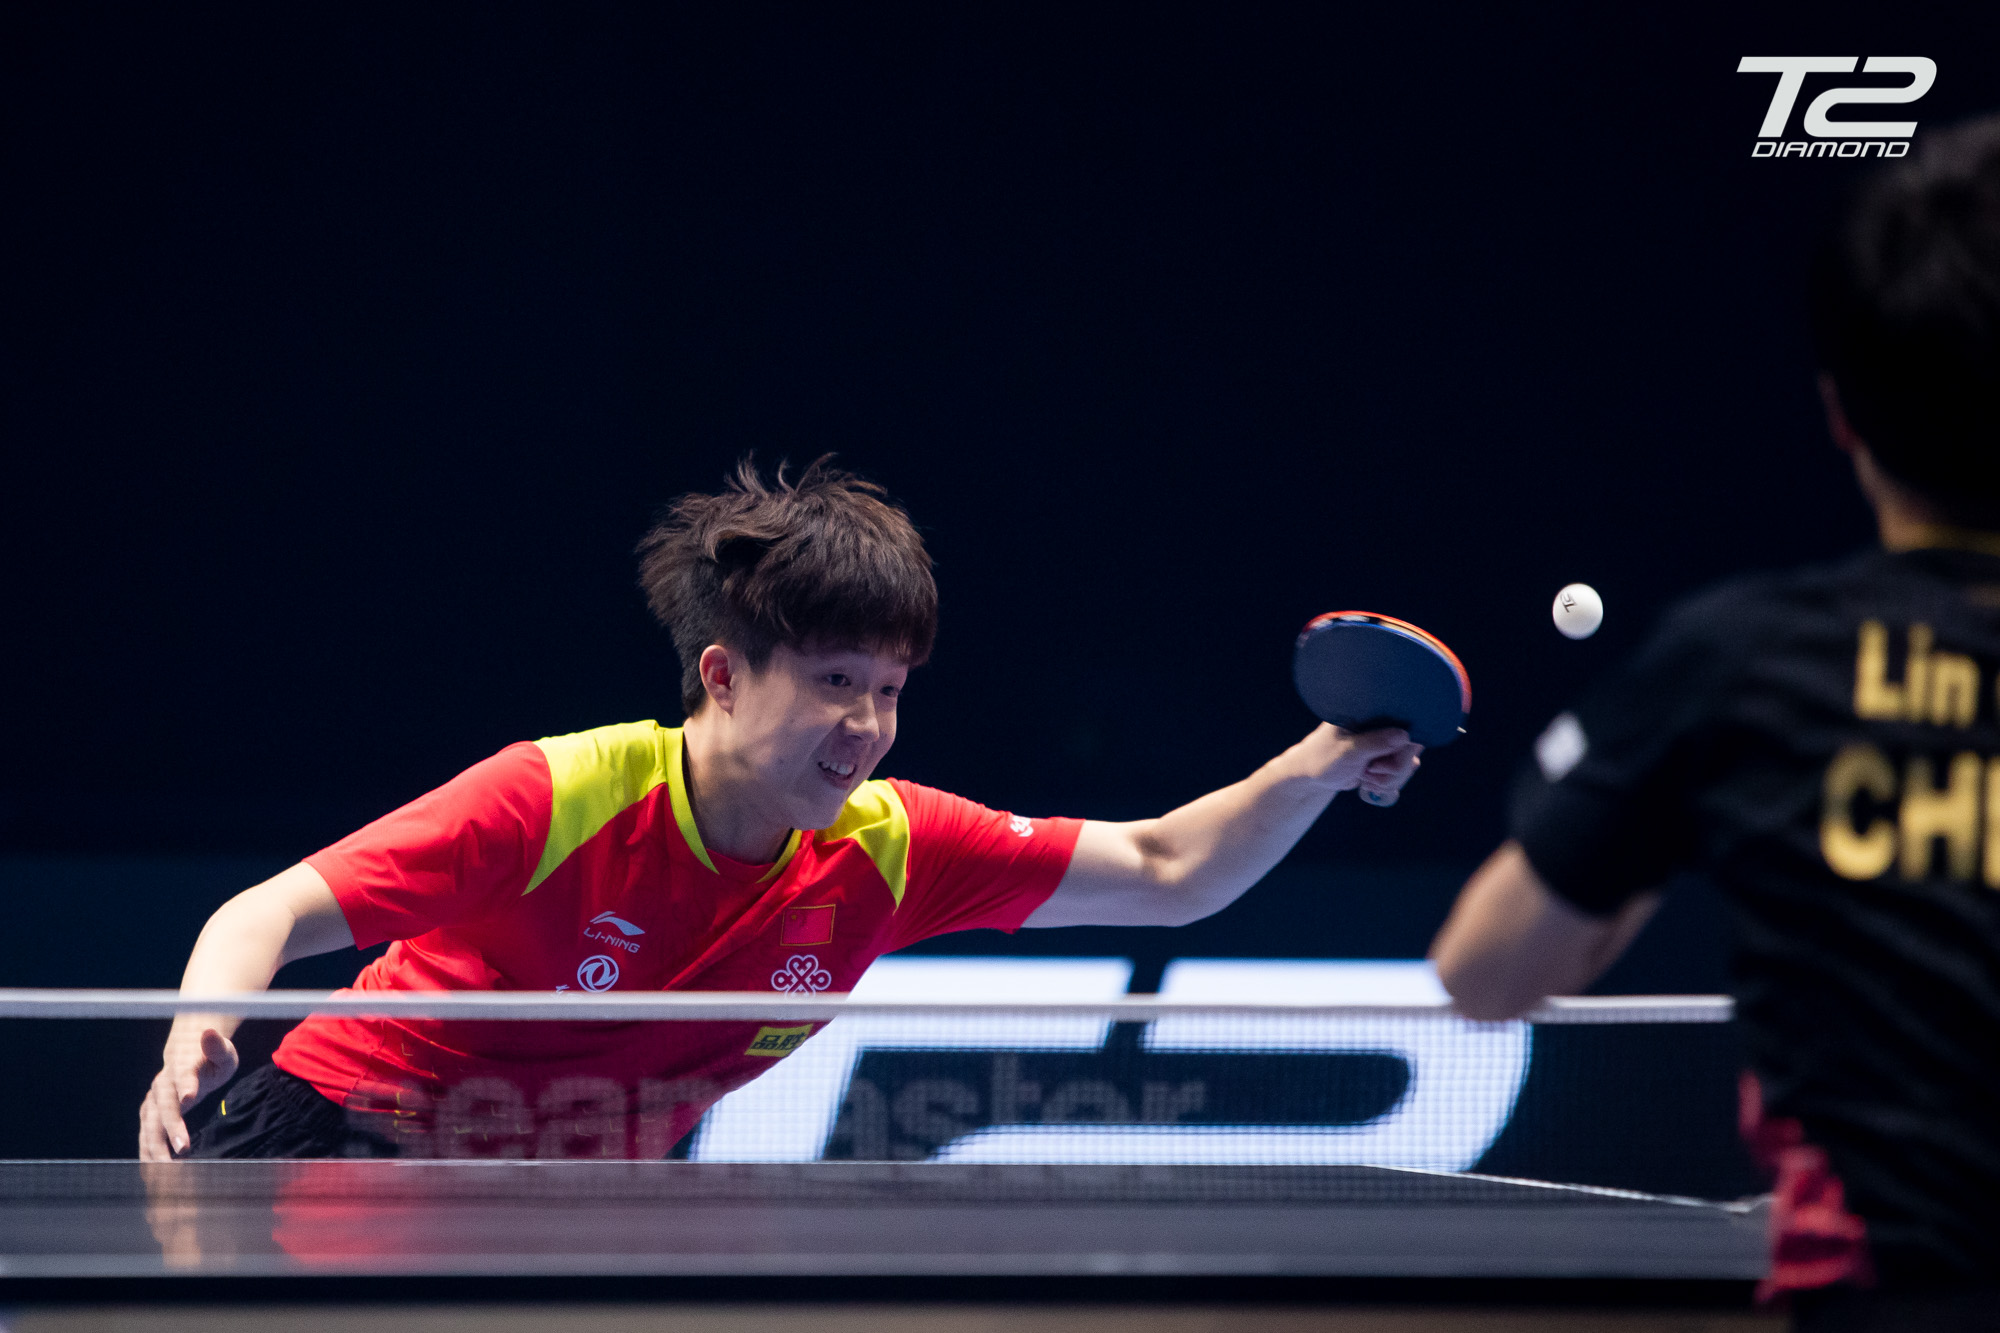 20190718_Match1_R16_WANGchuqin_vs_LINgaoyuan_00016_WEBRES